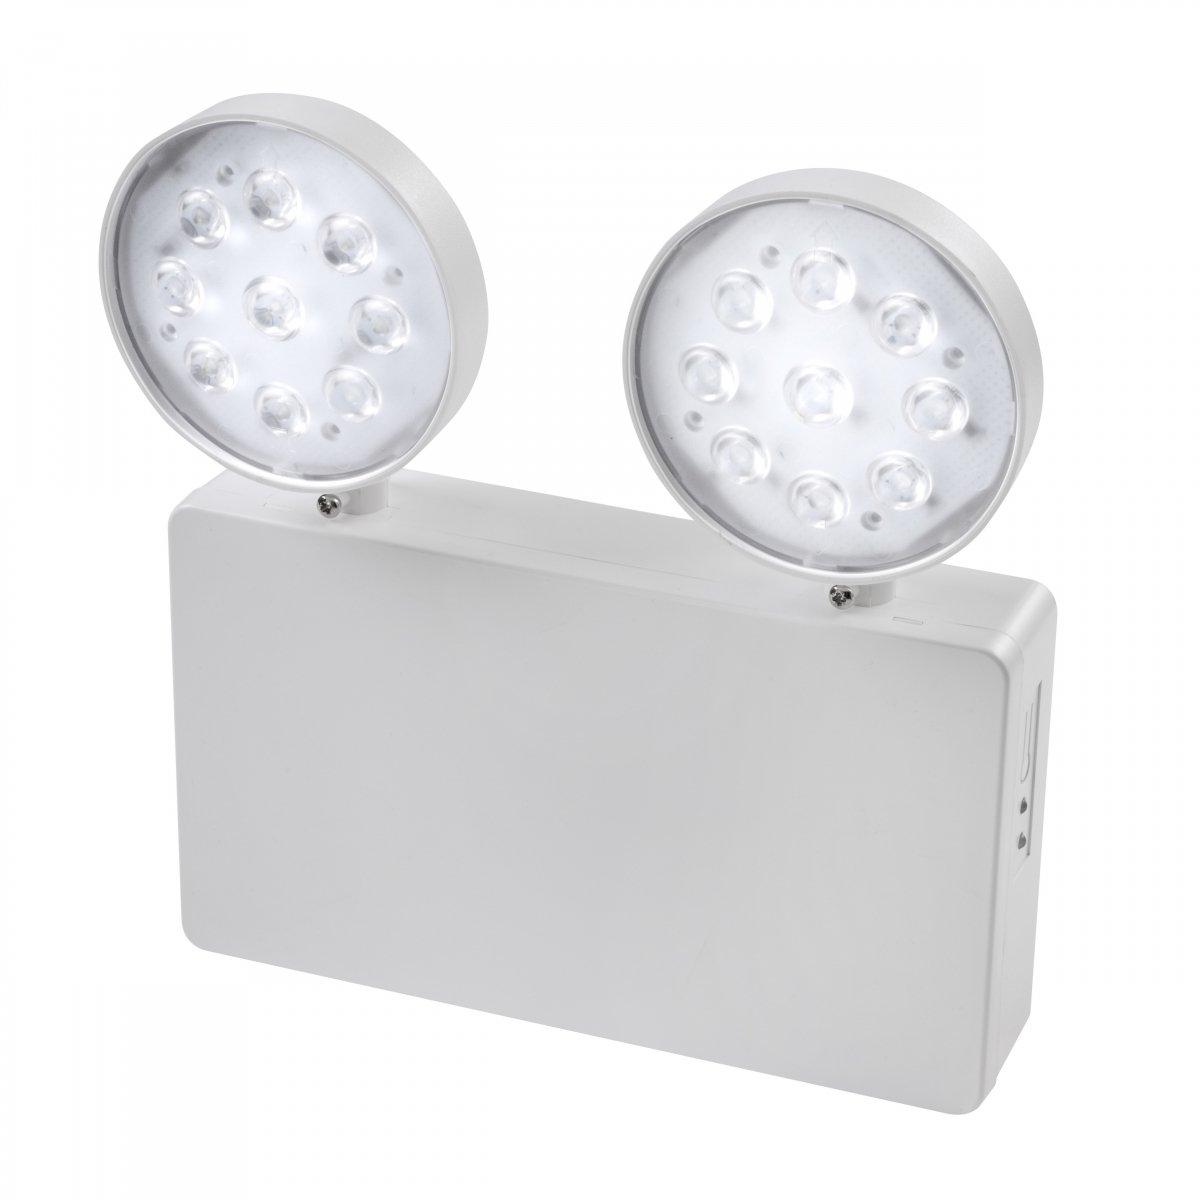 Outdoor Lights Revit: Twin Spot LED